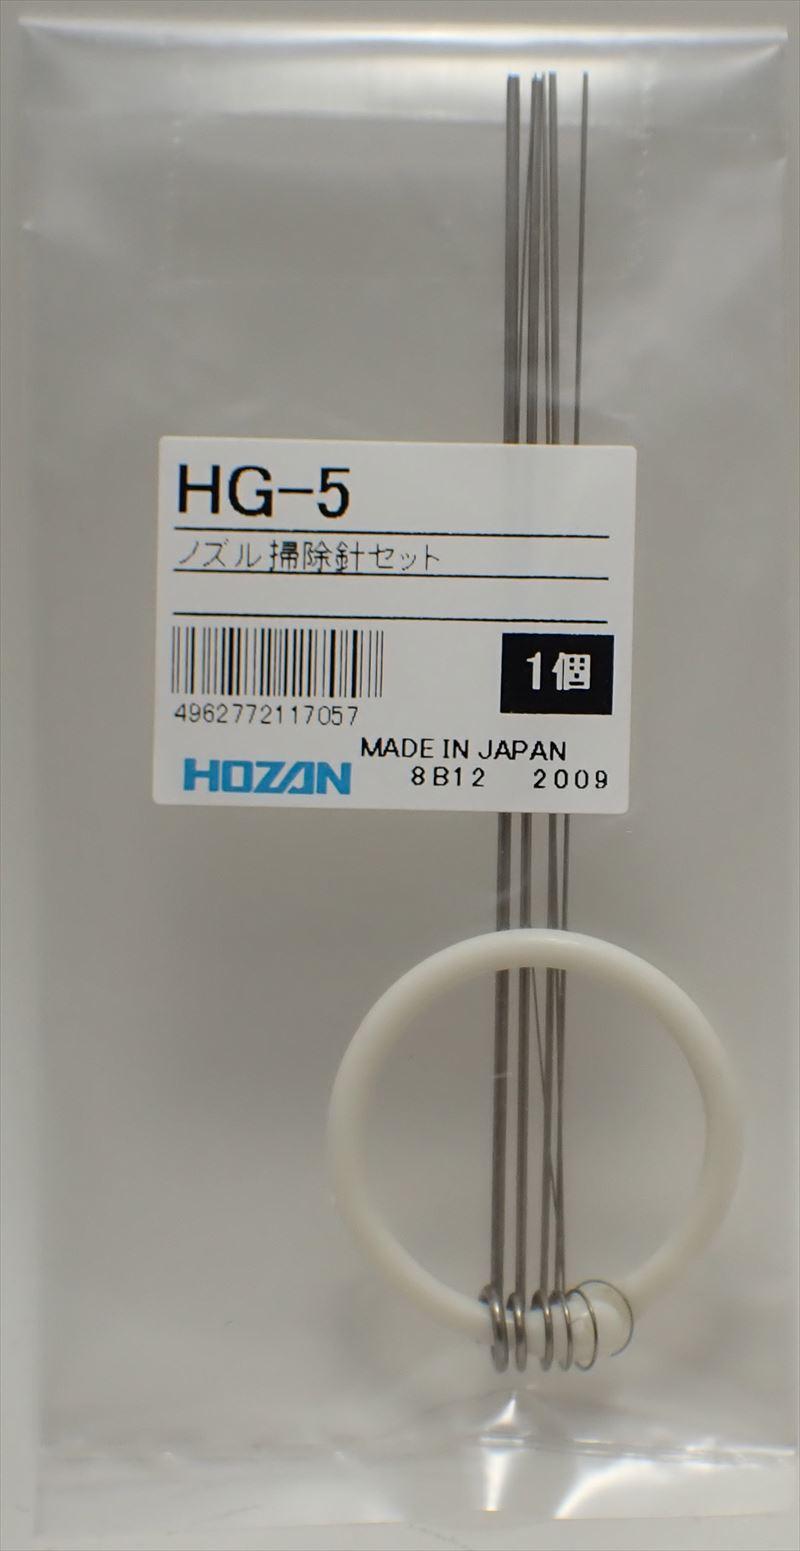 HG-5 ノズル掃除針セット 【HOZAN】